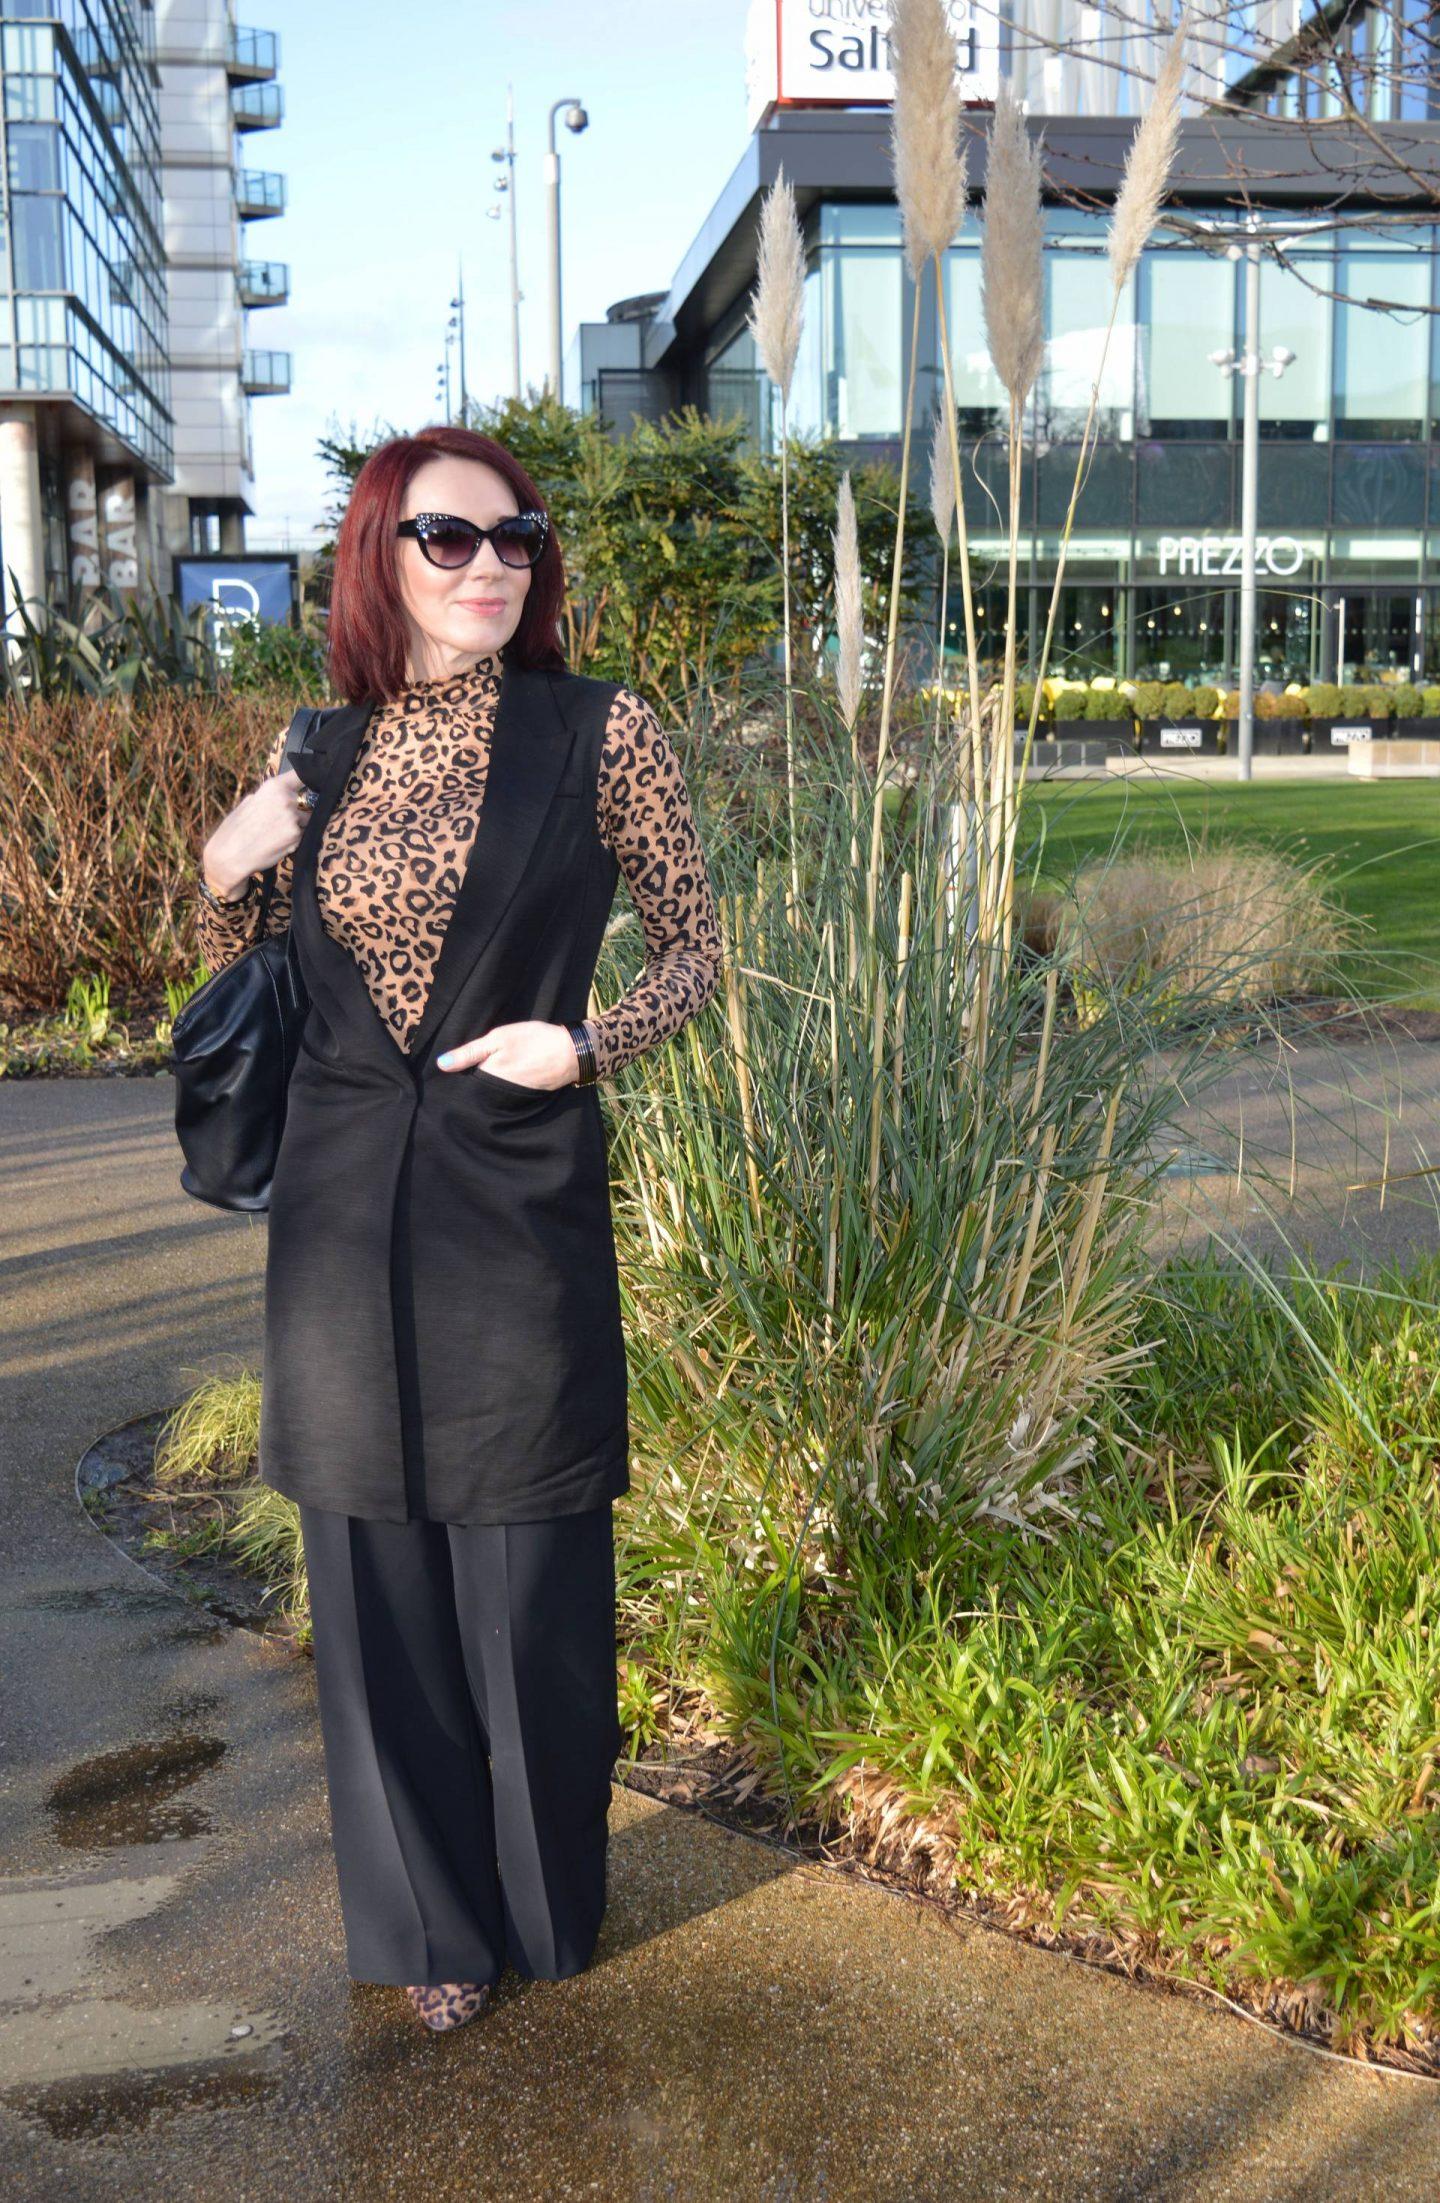 Classic Black and Leopard Print, Marks & Spencer black sleeveless jacket